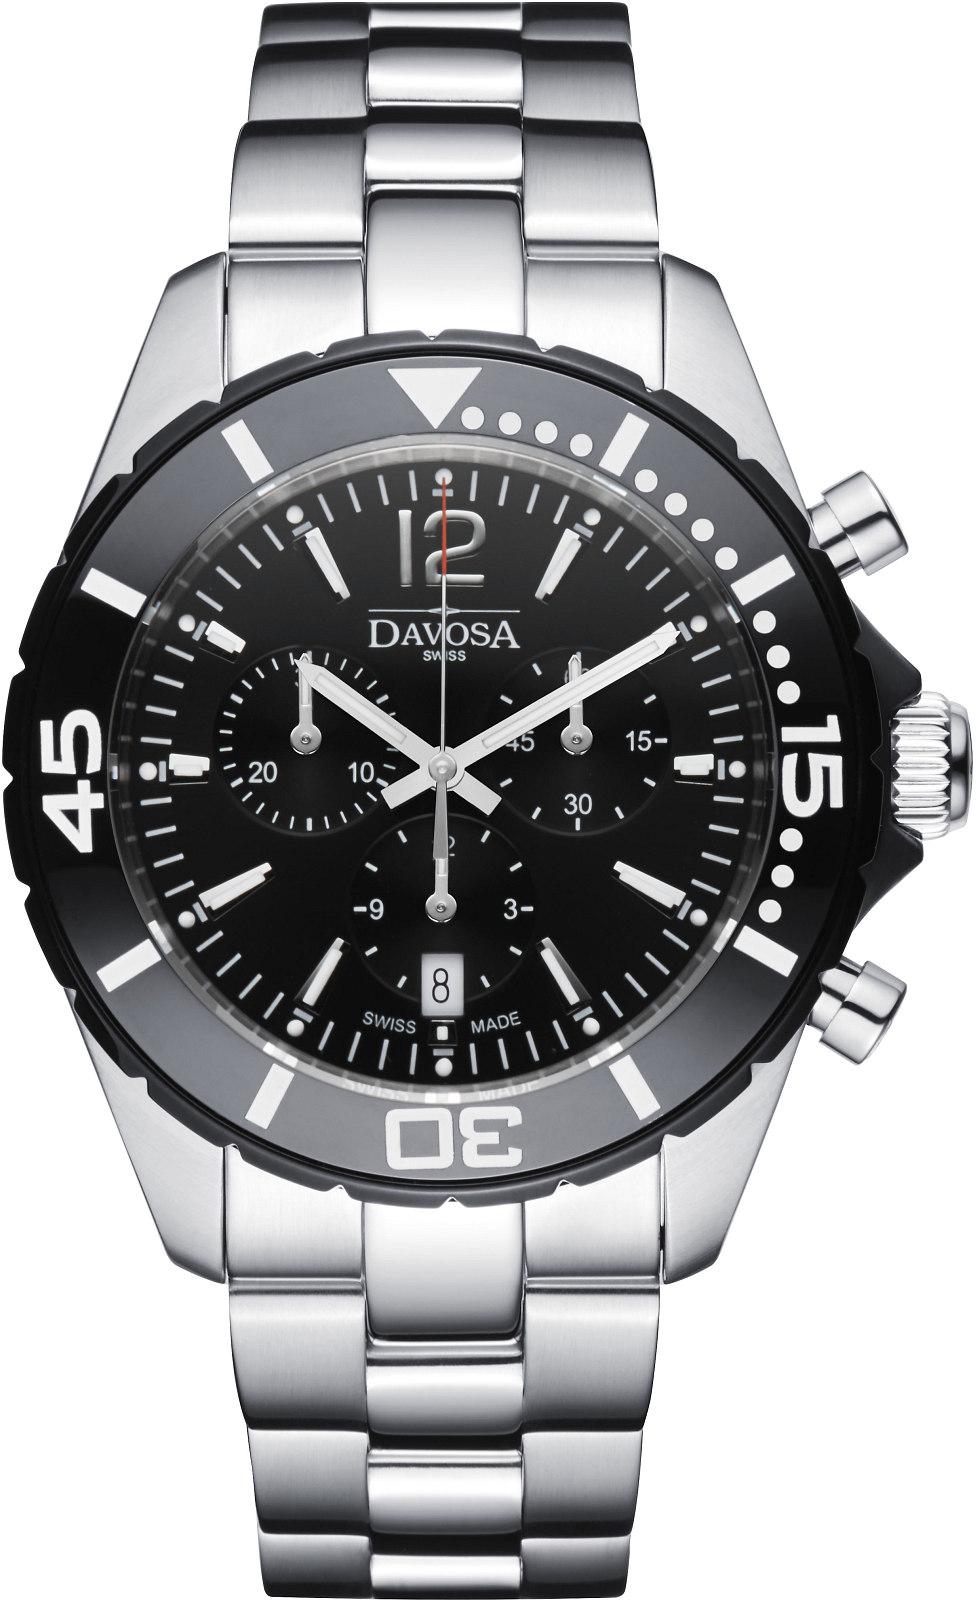 zegarek-meski-davosa-nautic-star-chrono-163-473-15-2